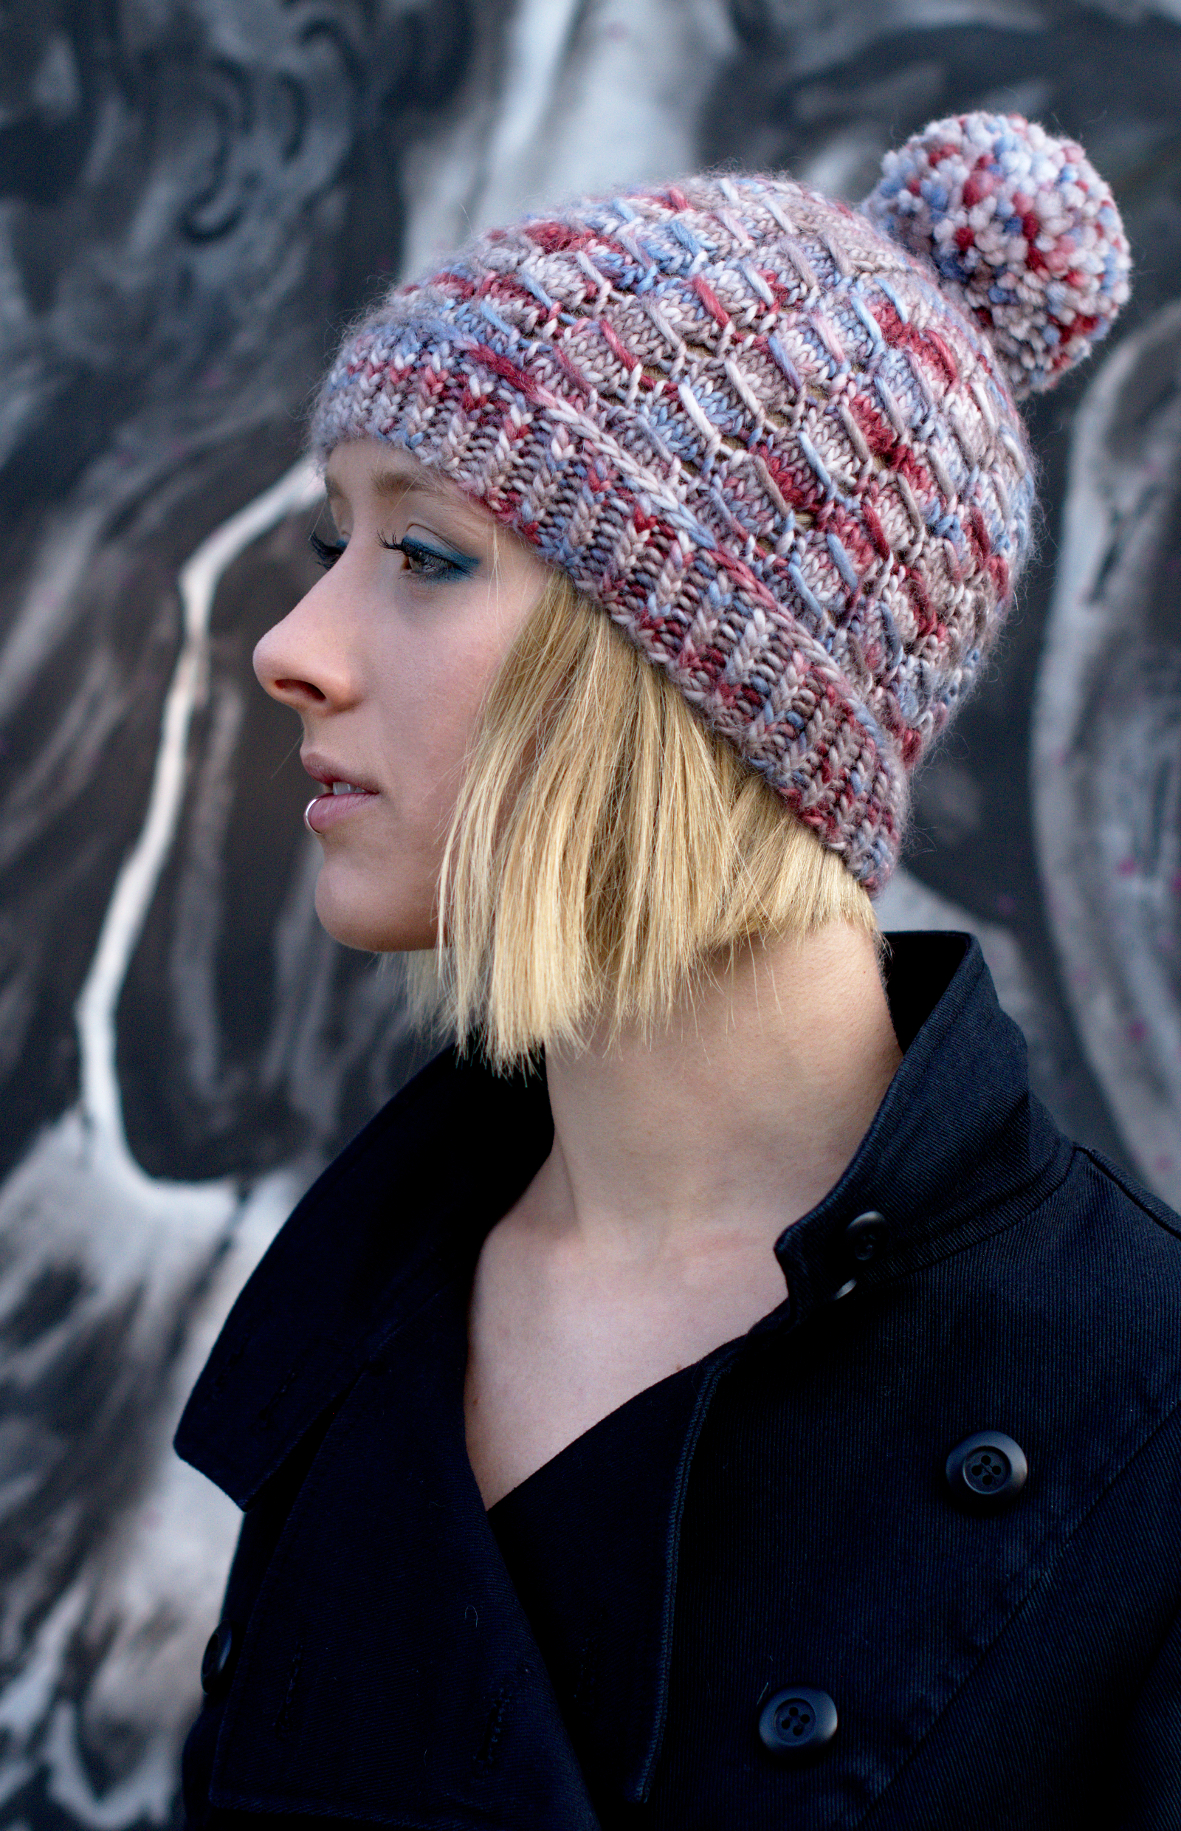 Laccio beanie hand knitting pattern for aran weight yarn